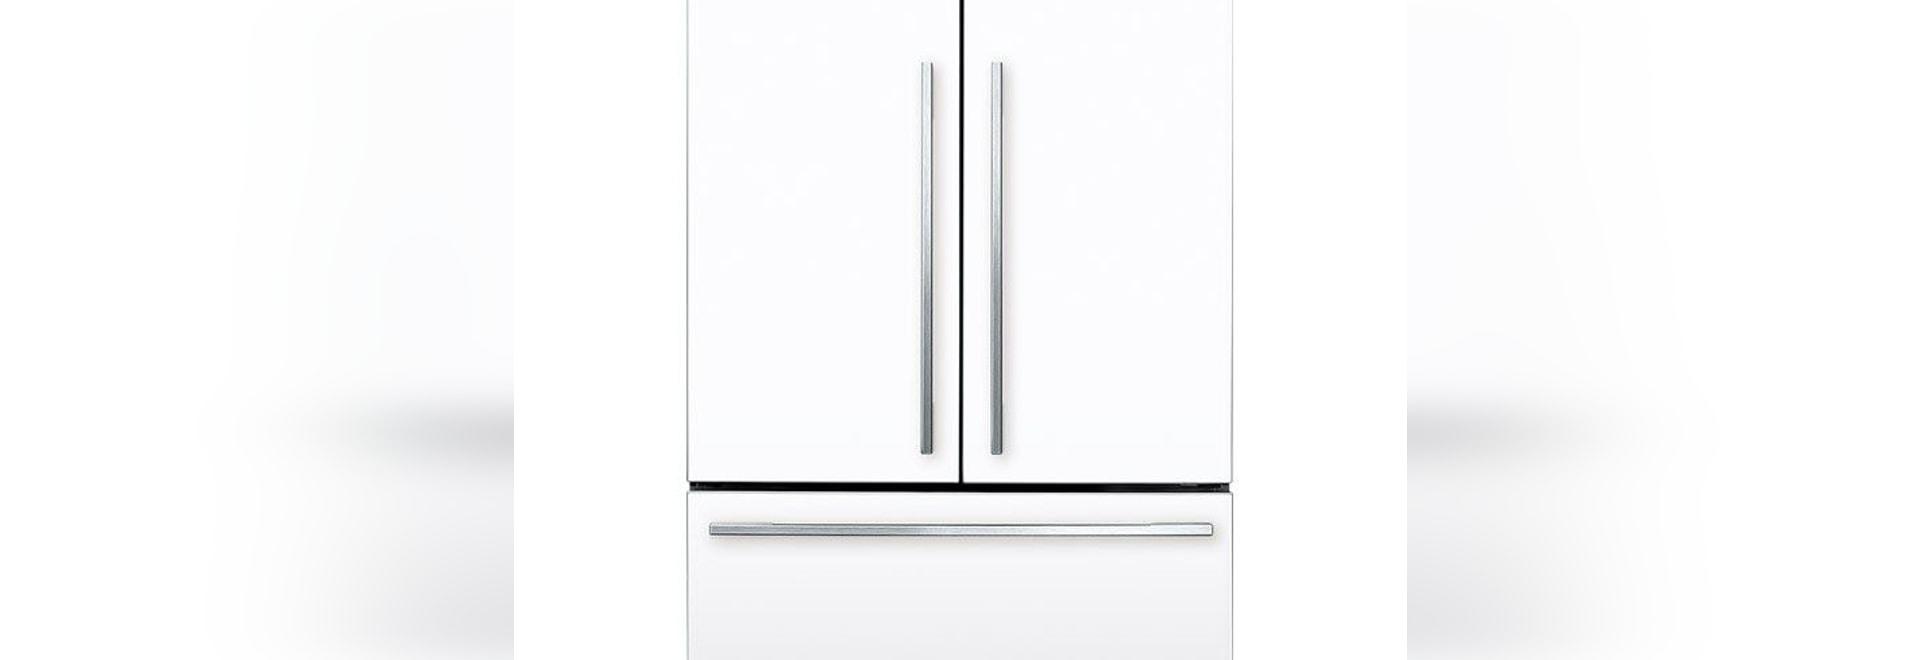 ActiveSmart™ refrigerator by Fischer and Paykel - Fischer and Paykel